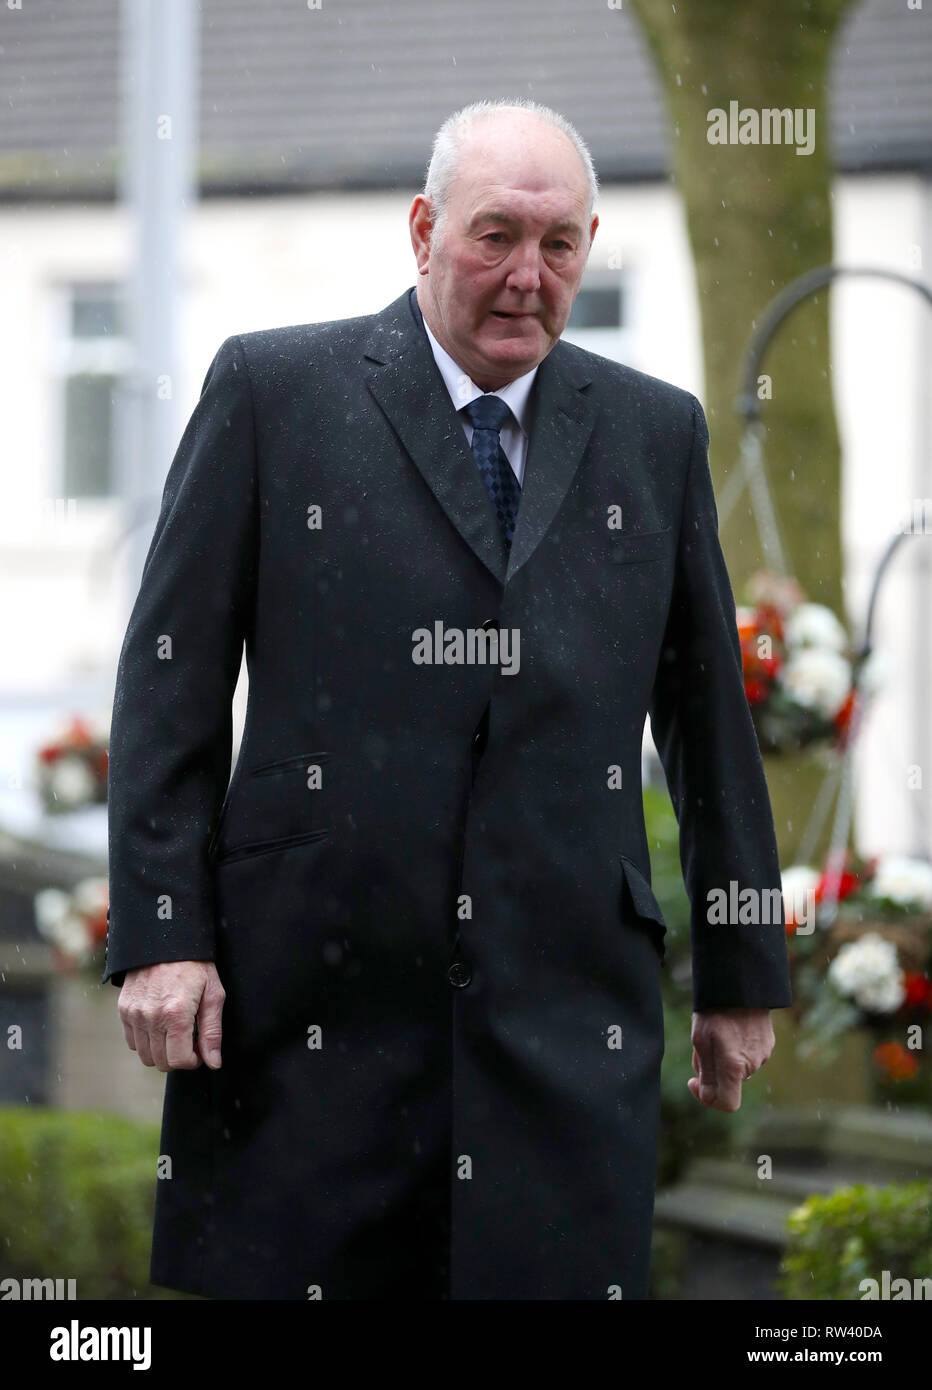 Retired goalkeeper Joe Corrigan arrives at the funeral service for Gordon Banks at Stoke Minster. - Stock Image